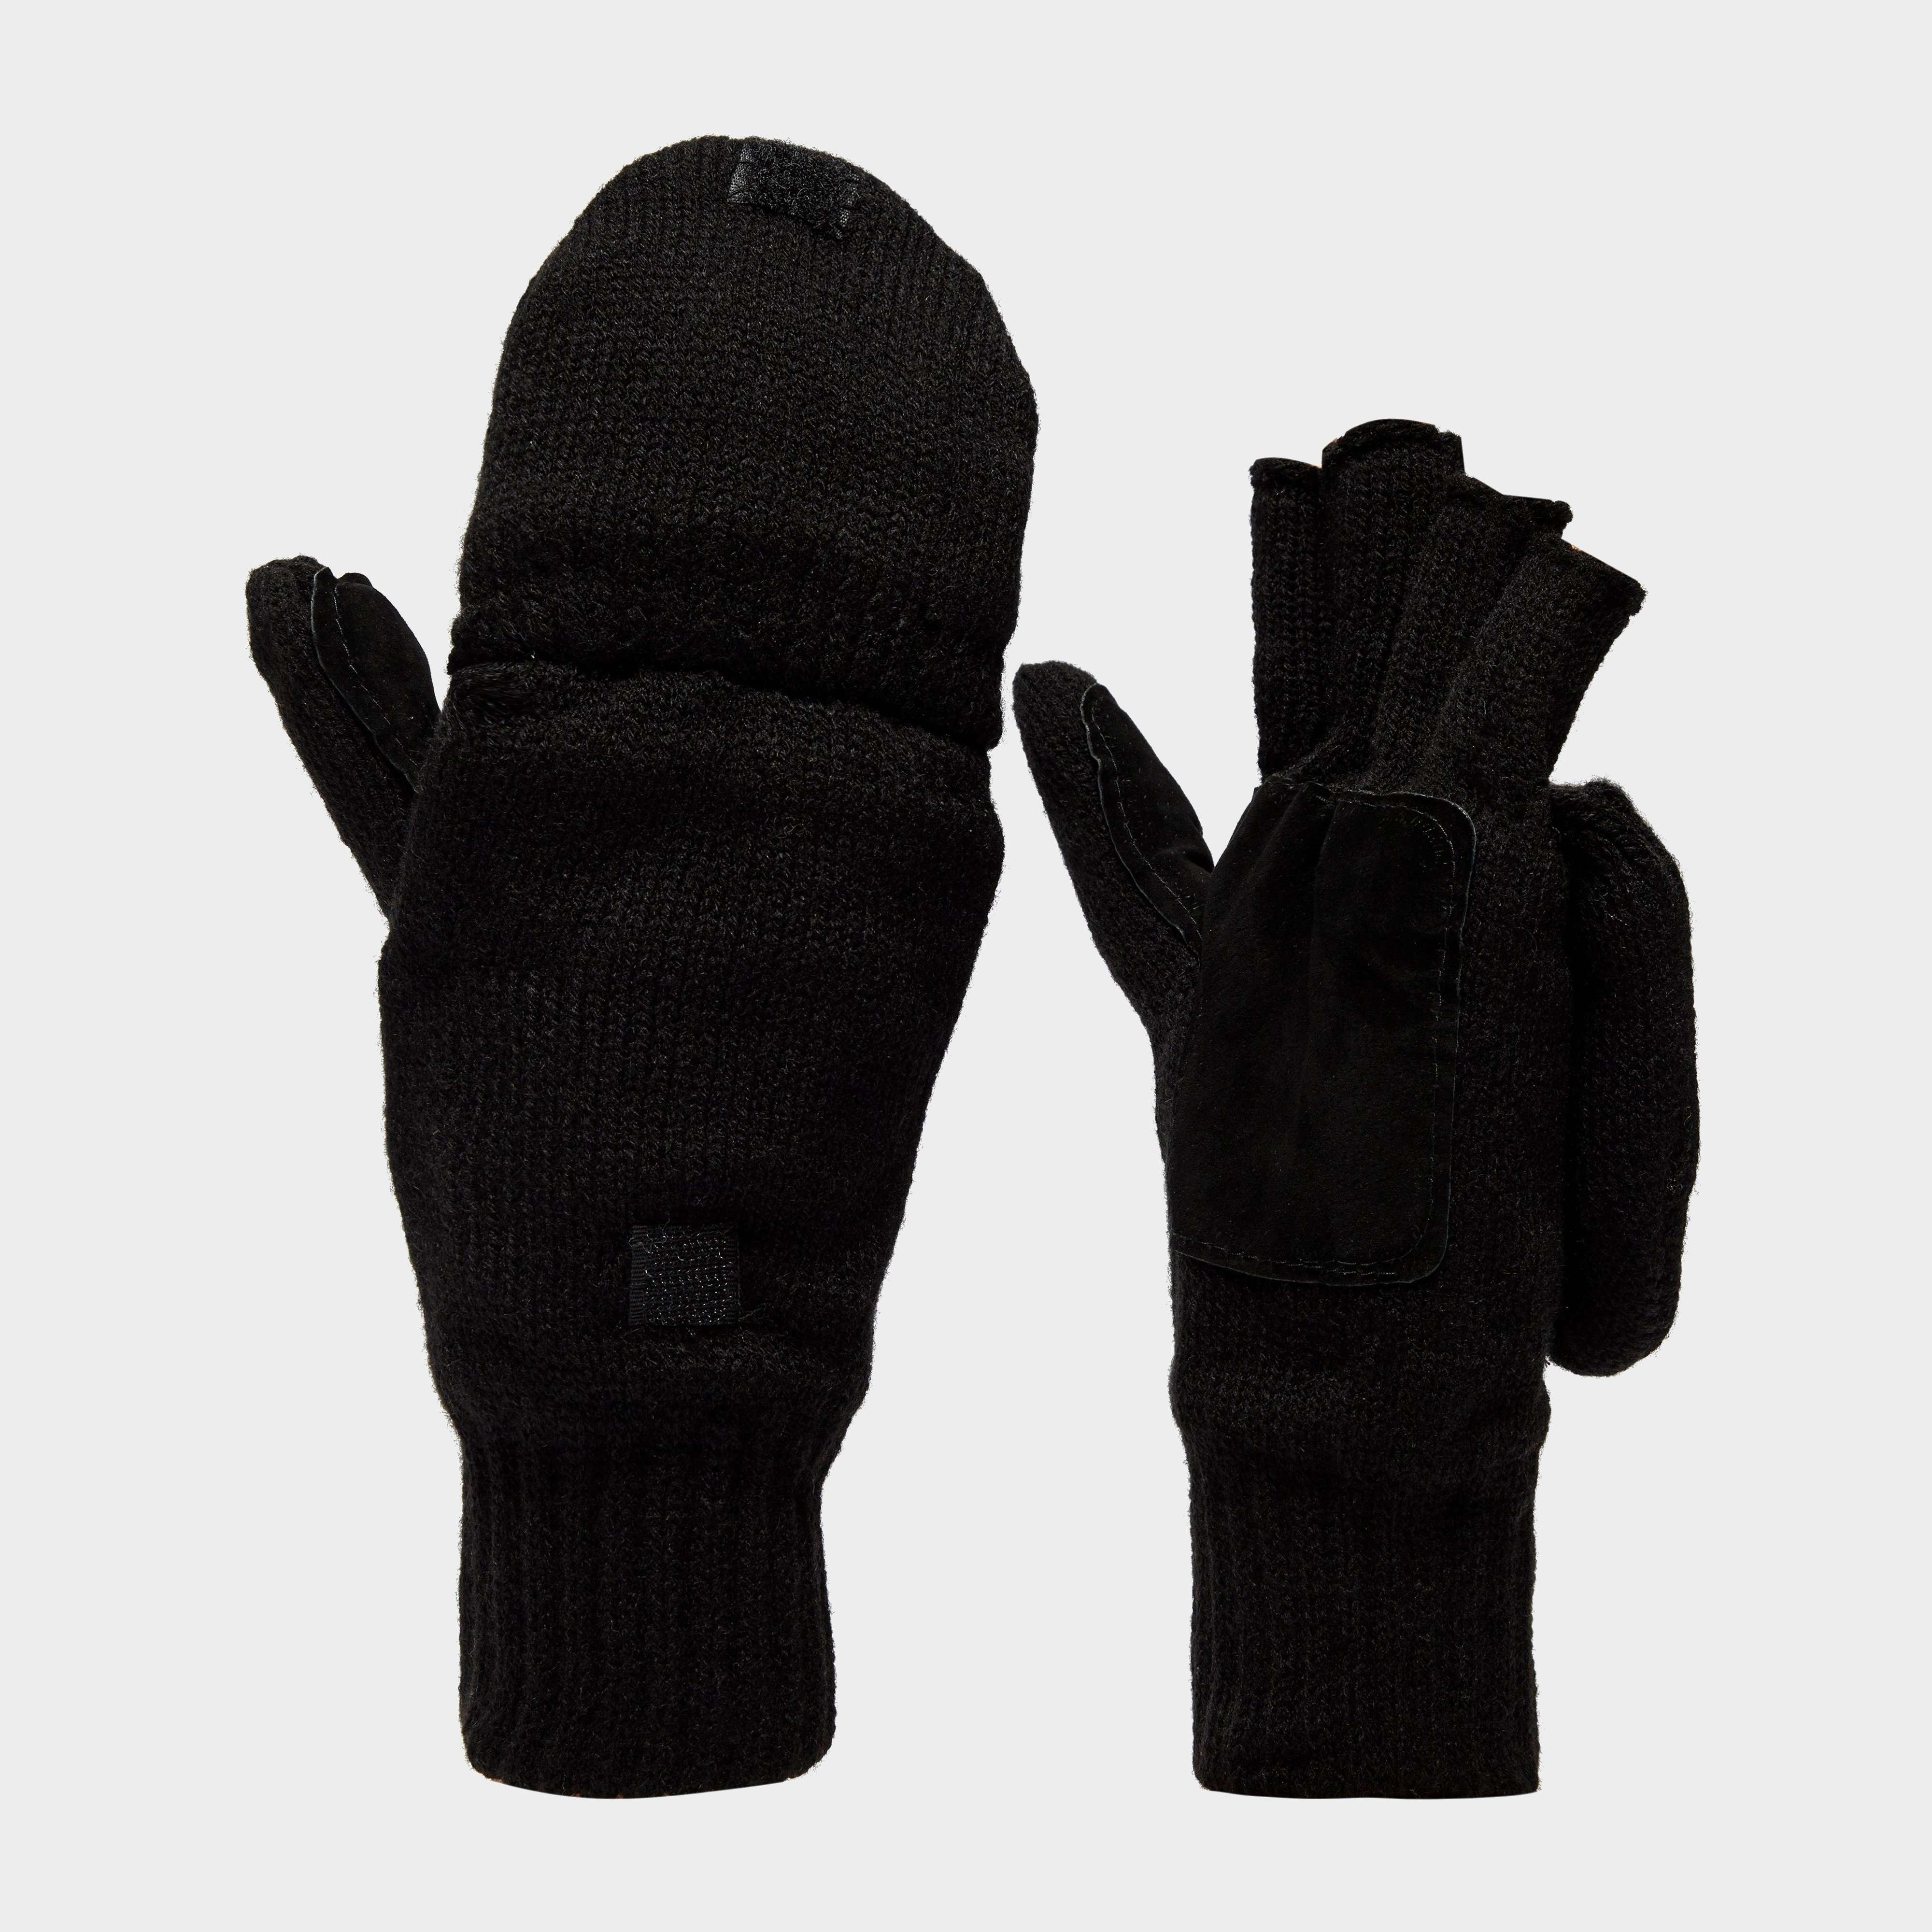 PETER STORM Men's Convertible Gloves